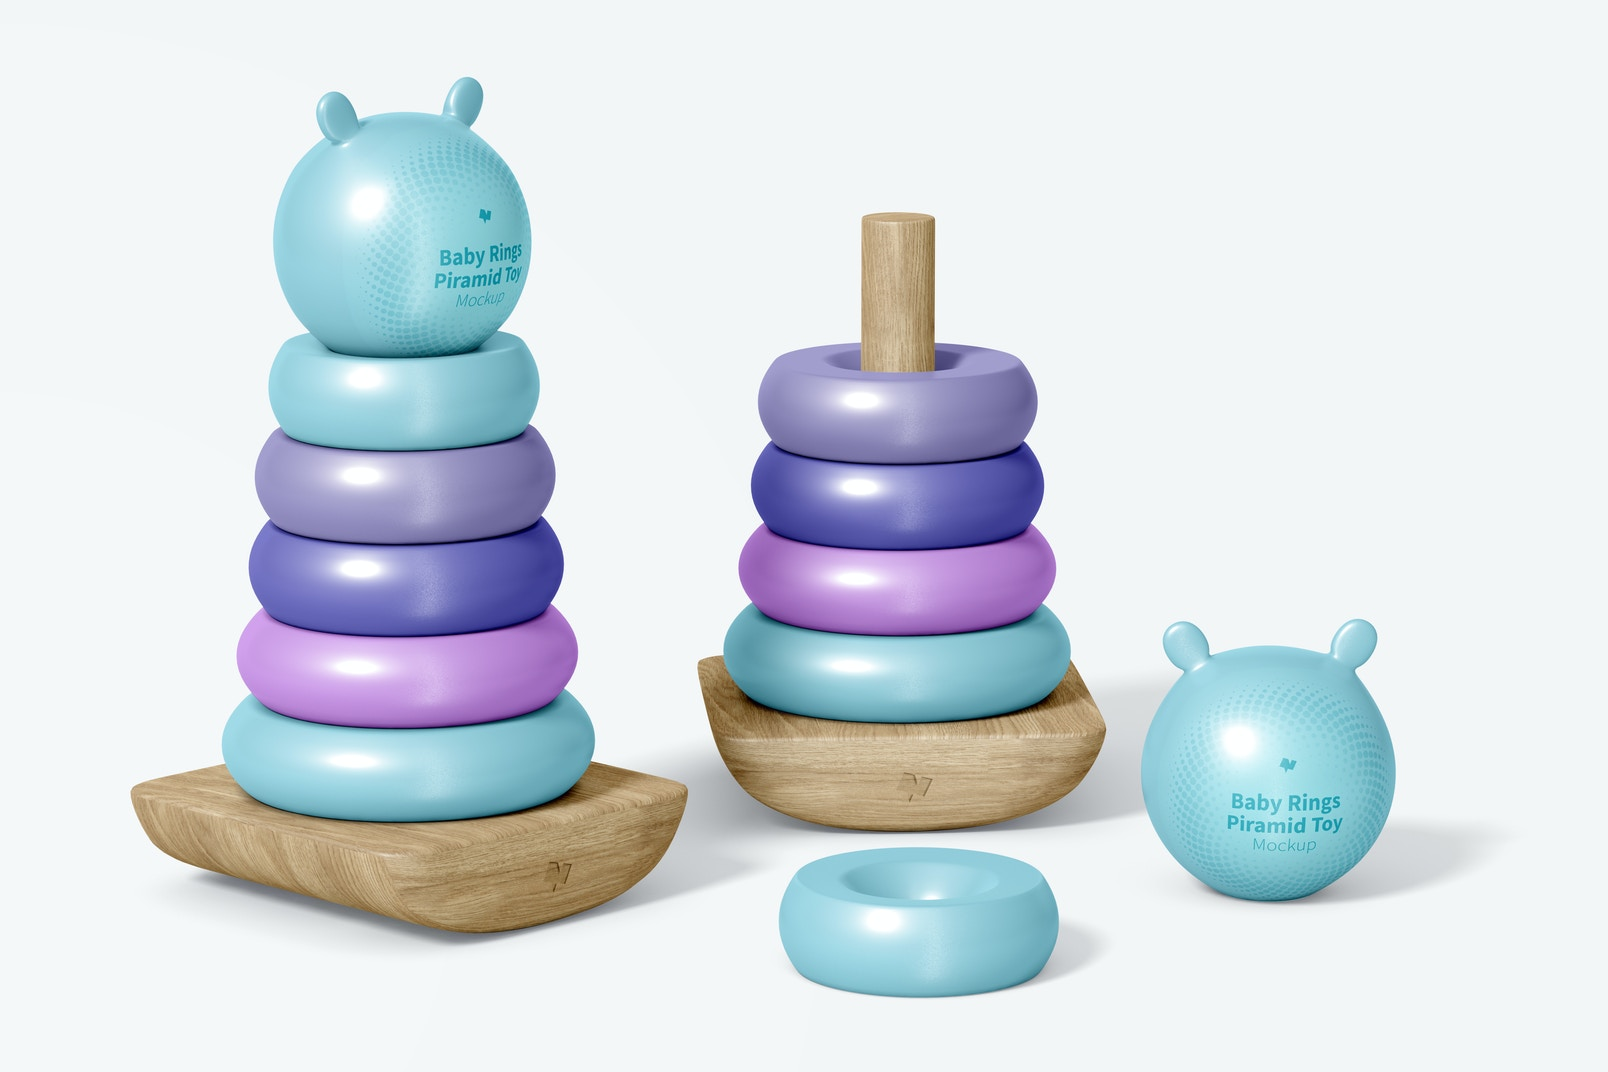 Baby Ring Pyramid Toy Mockup, Top View